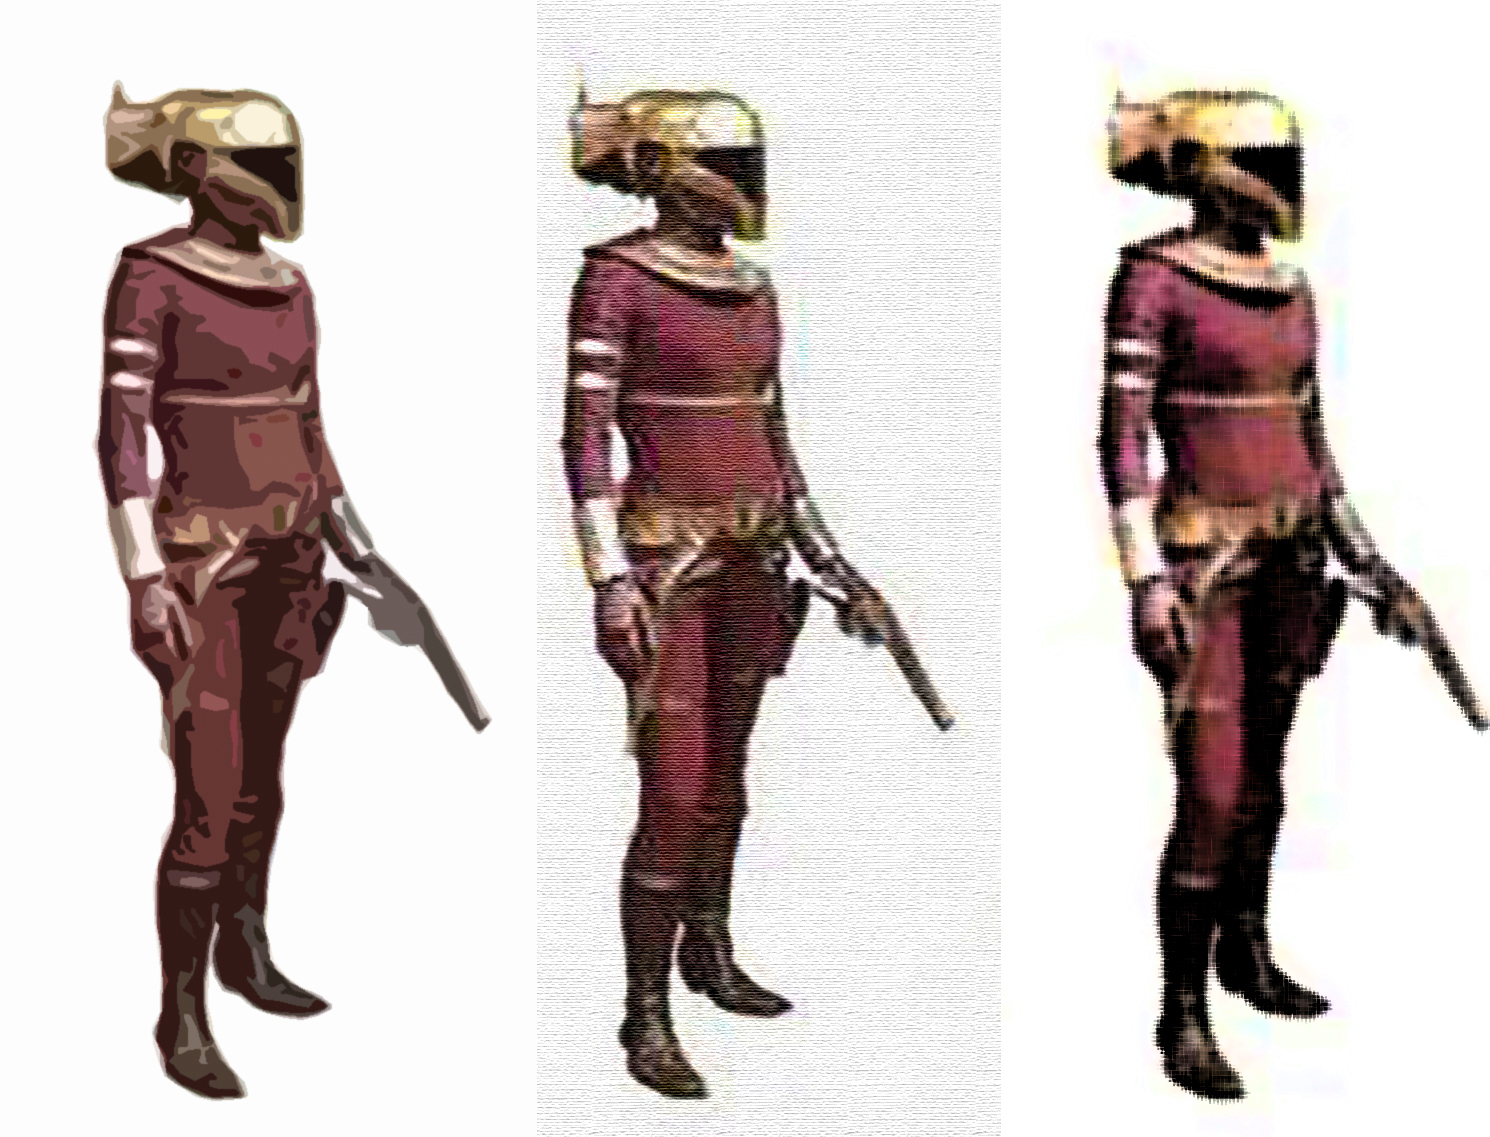 Zori The Bounty Hunter Played By Keri Russell Geek Carl